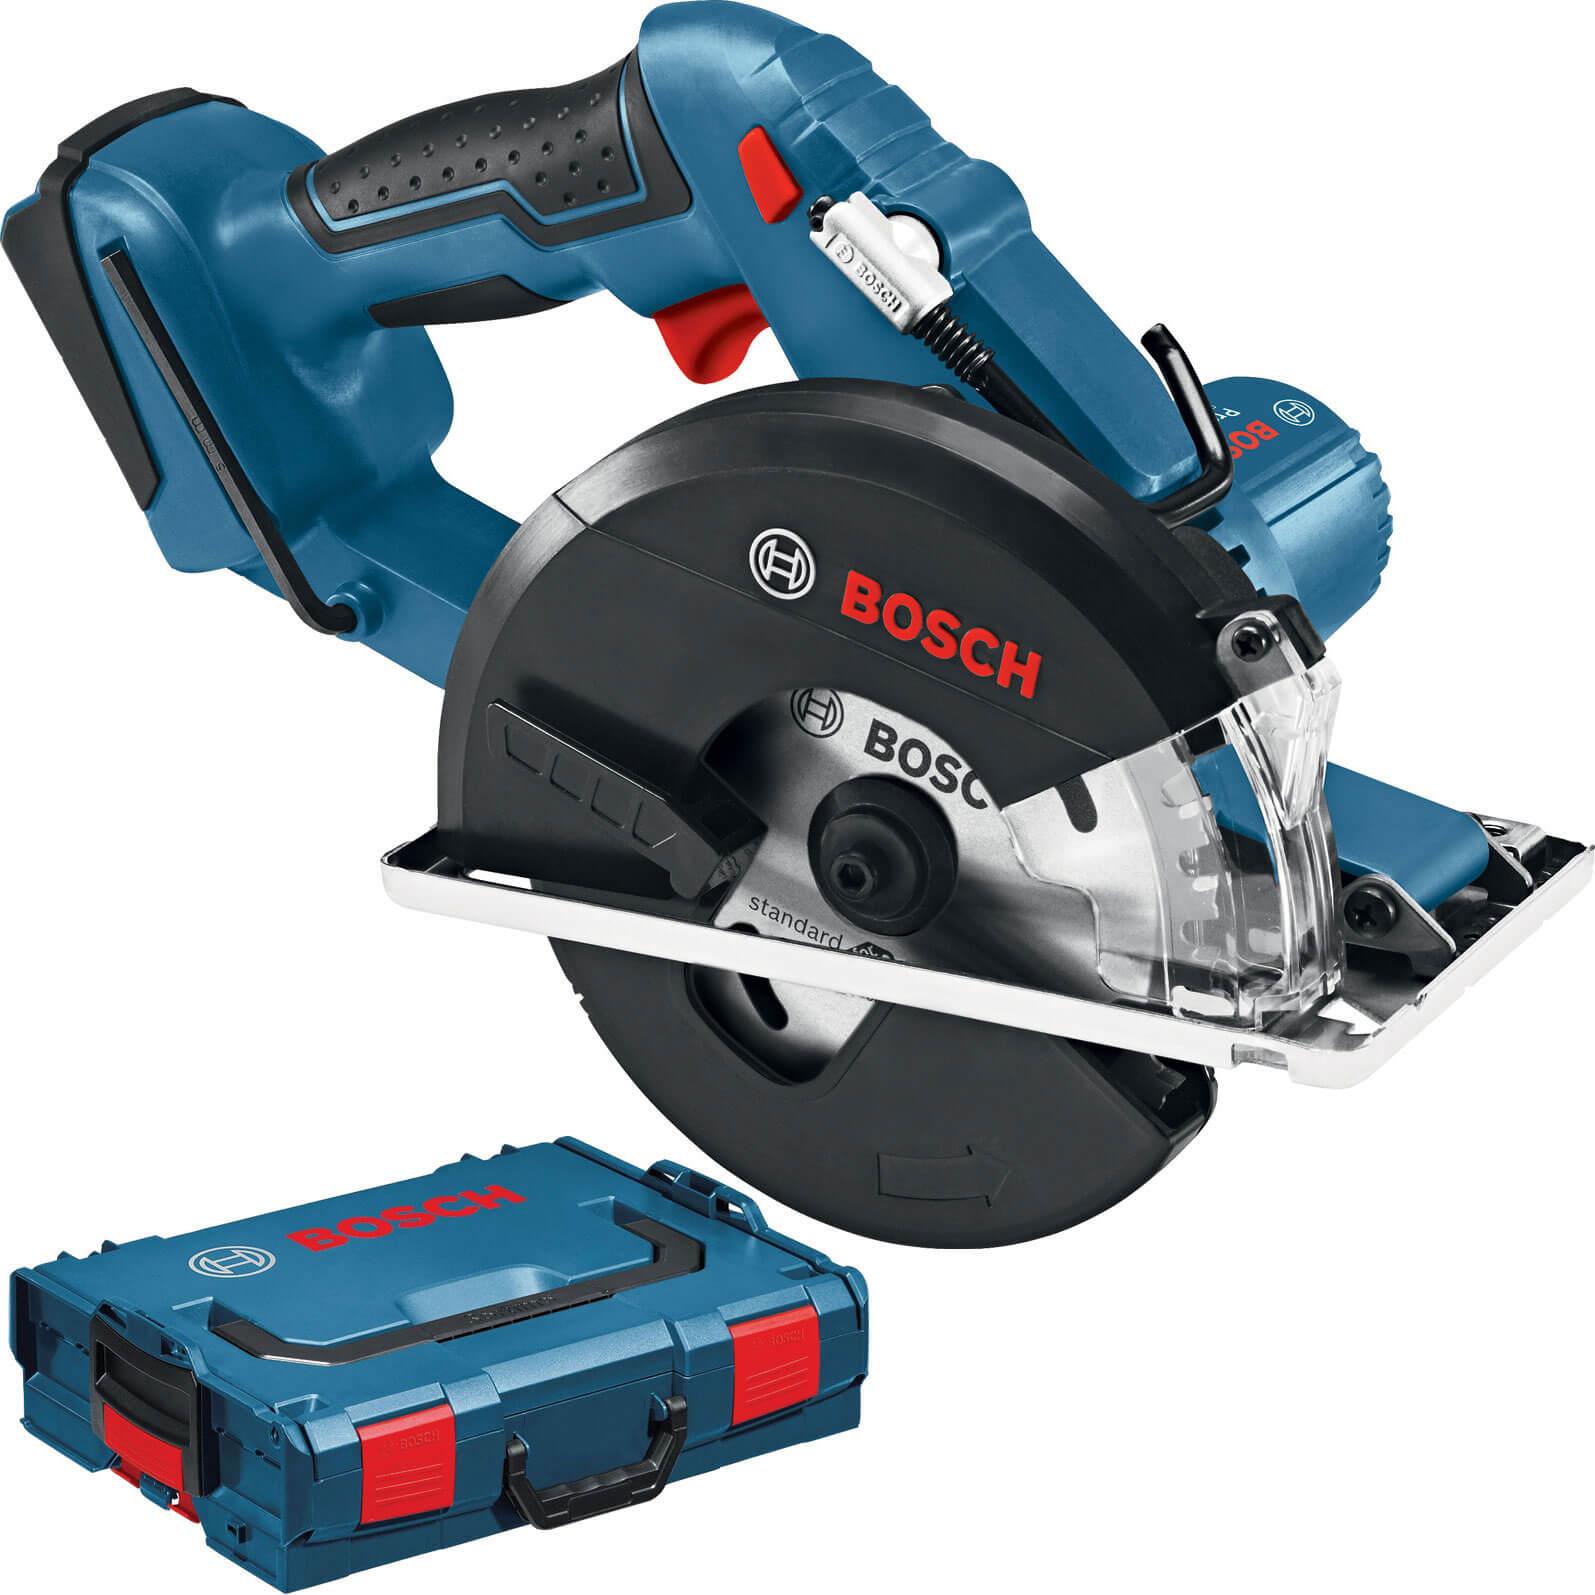 Image of Bosch GKM 18 V-LI Cordless Metal Cutting Circular Saw No Batteries No Charger Case